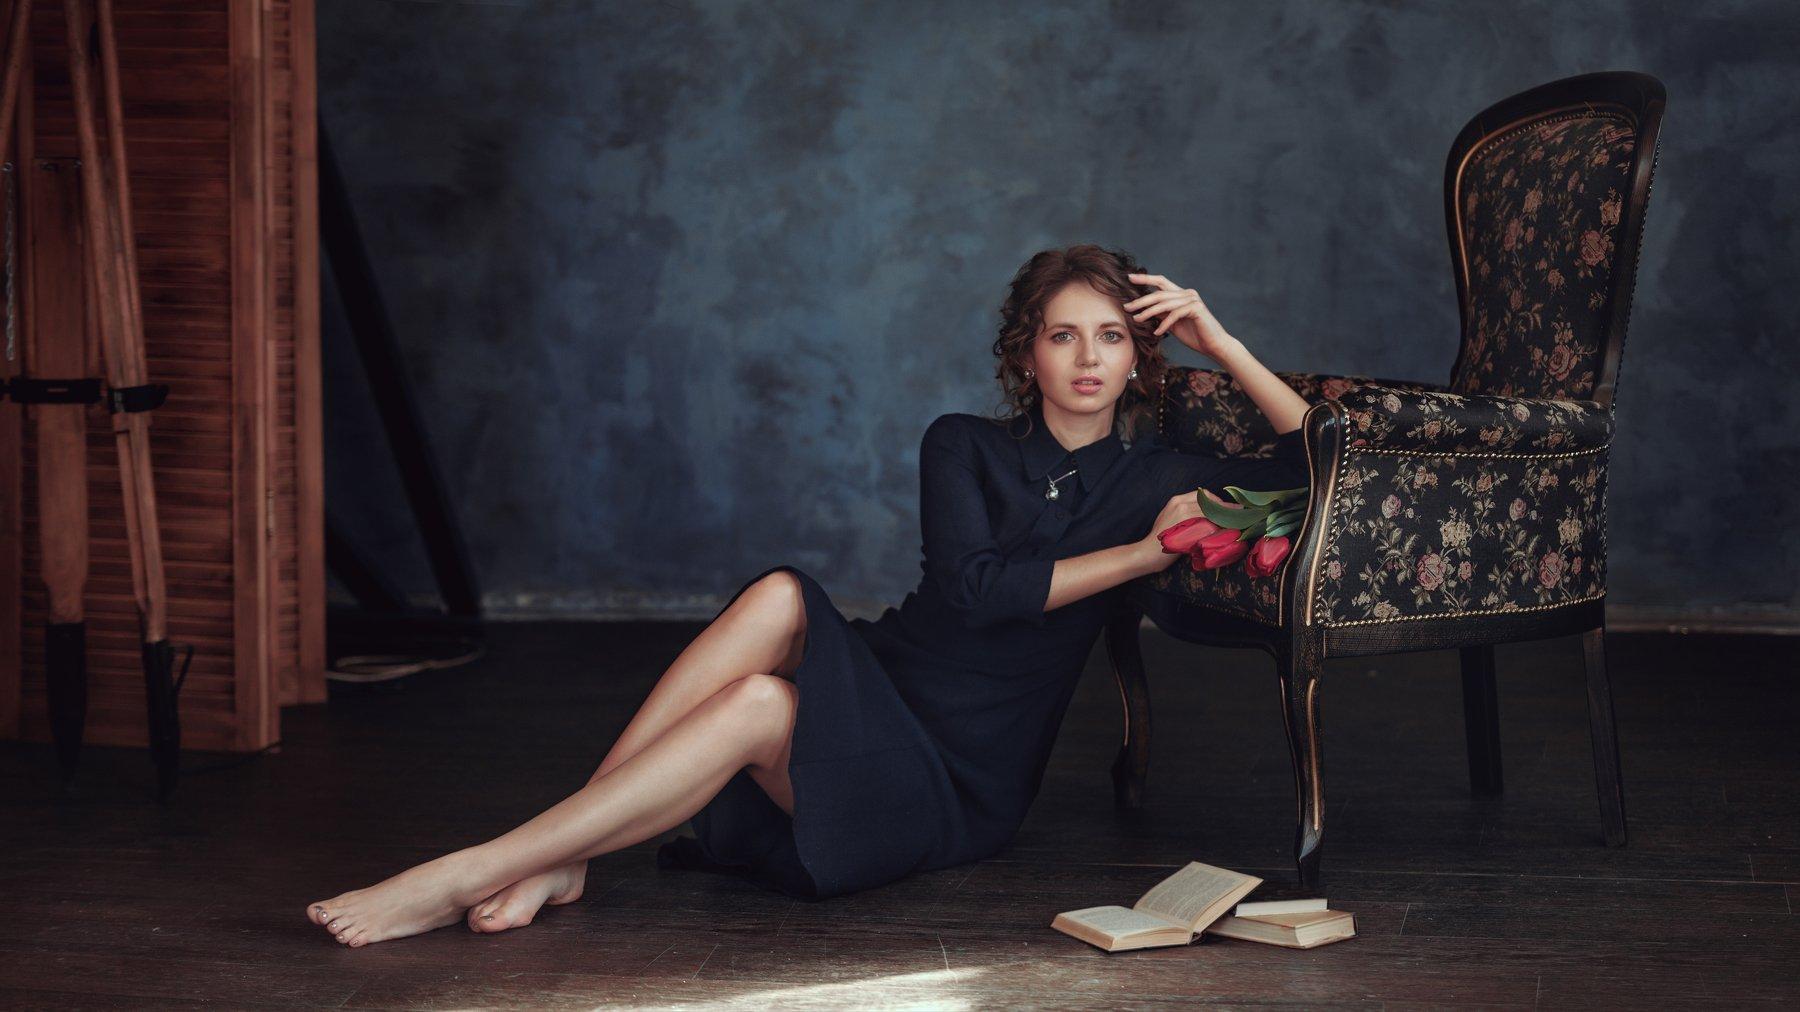 portrait, woman, light, canon, minsk, beautiful, Алексей